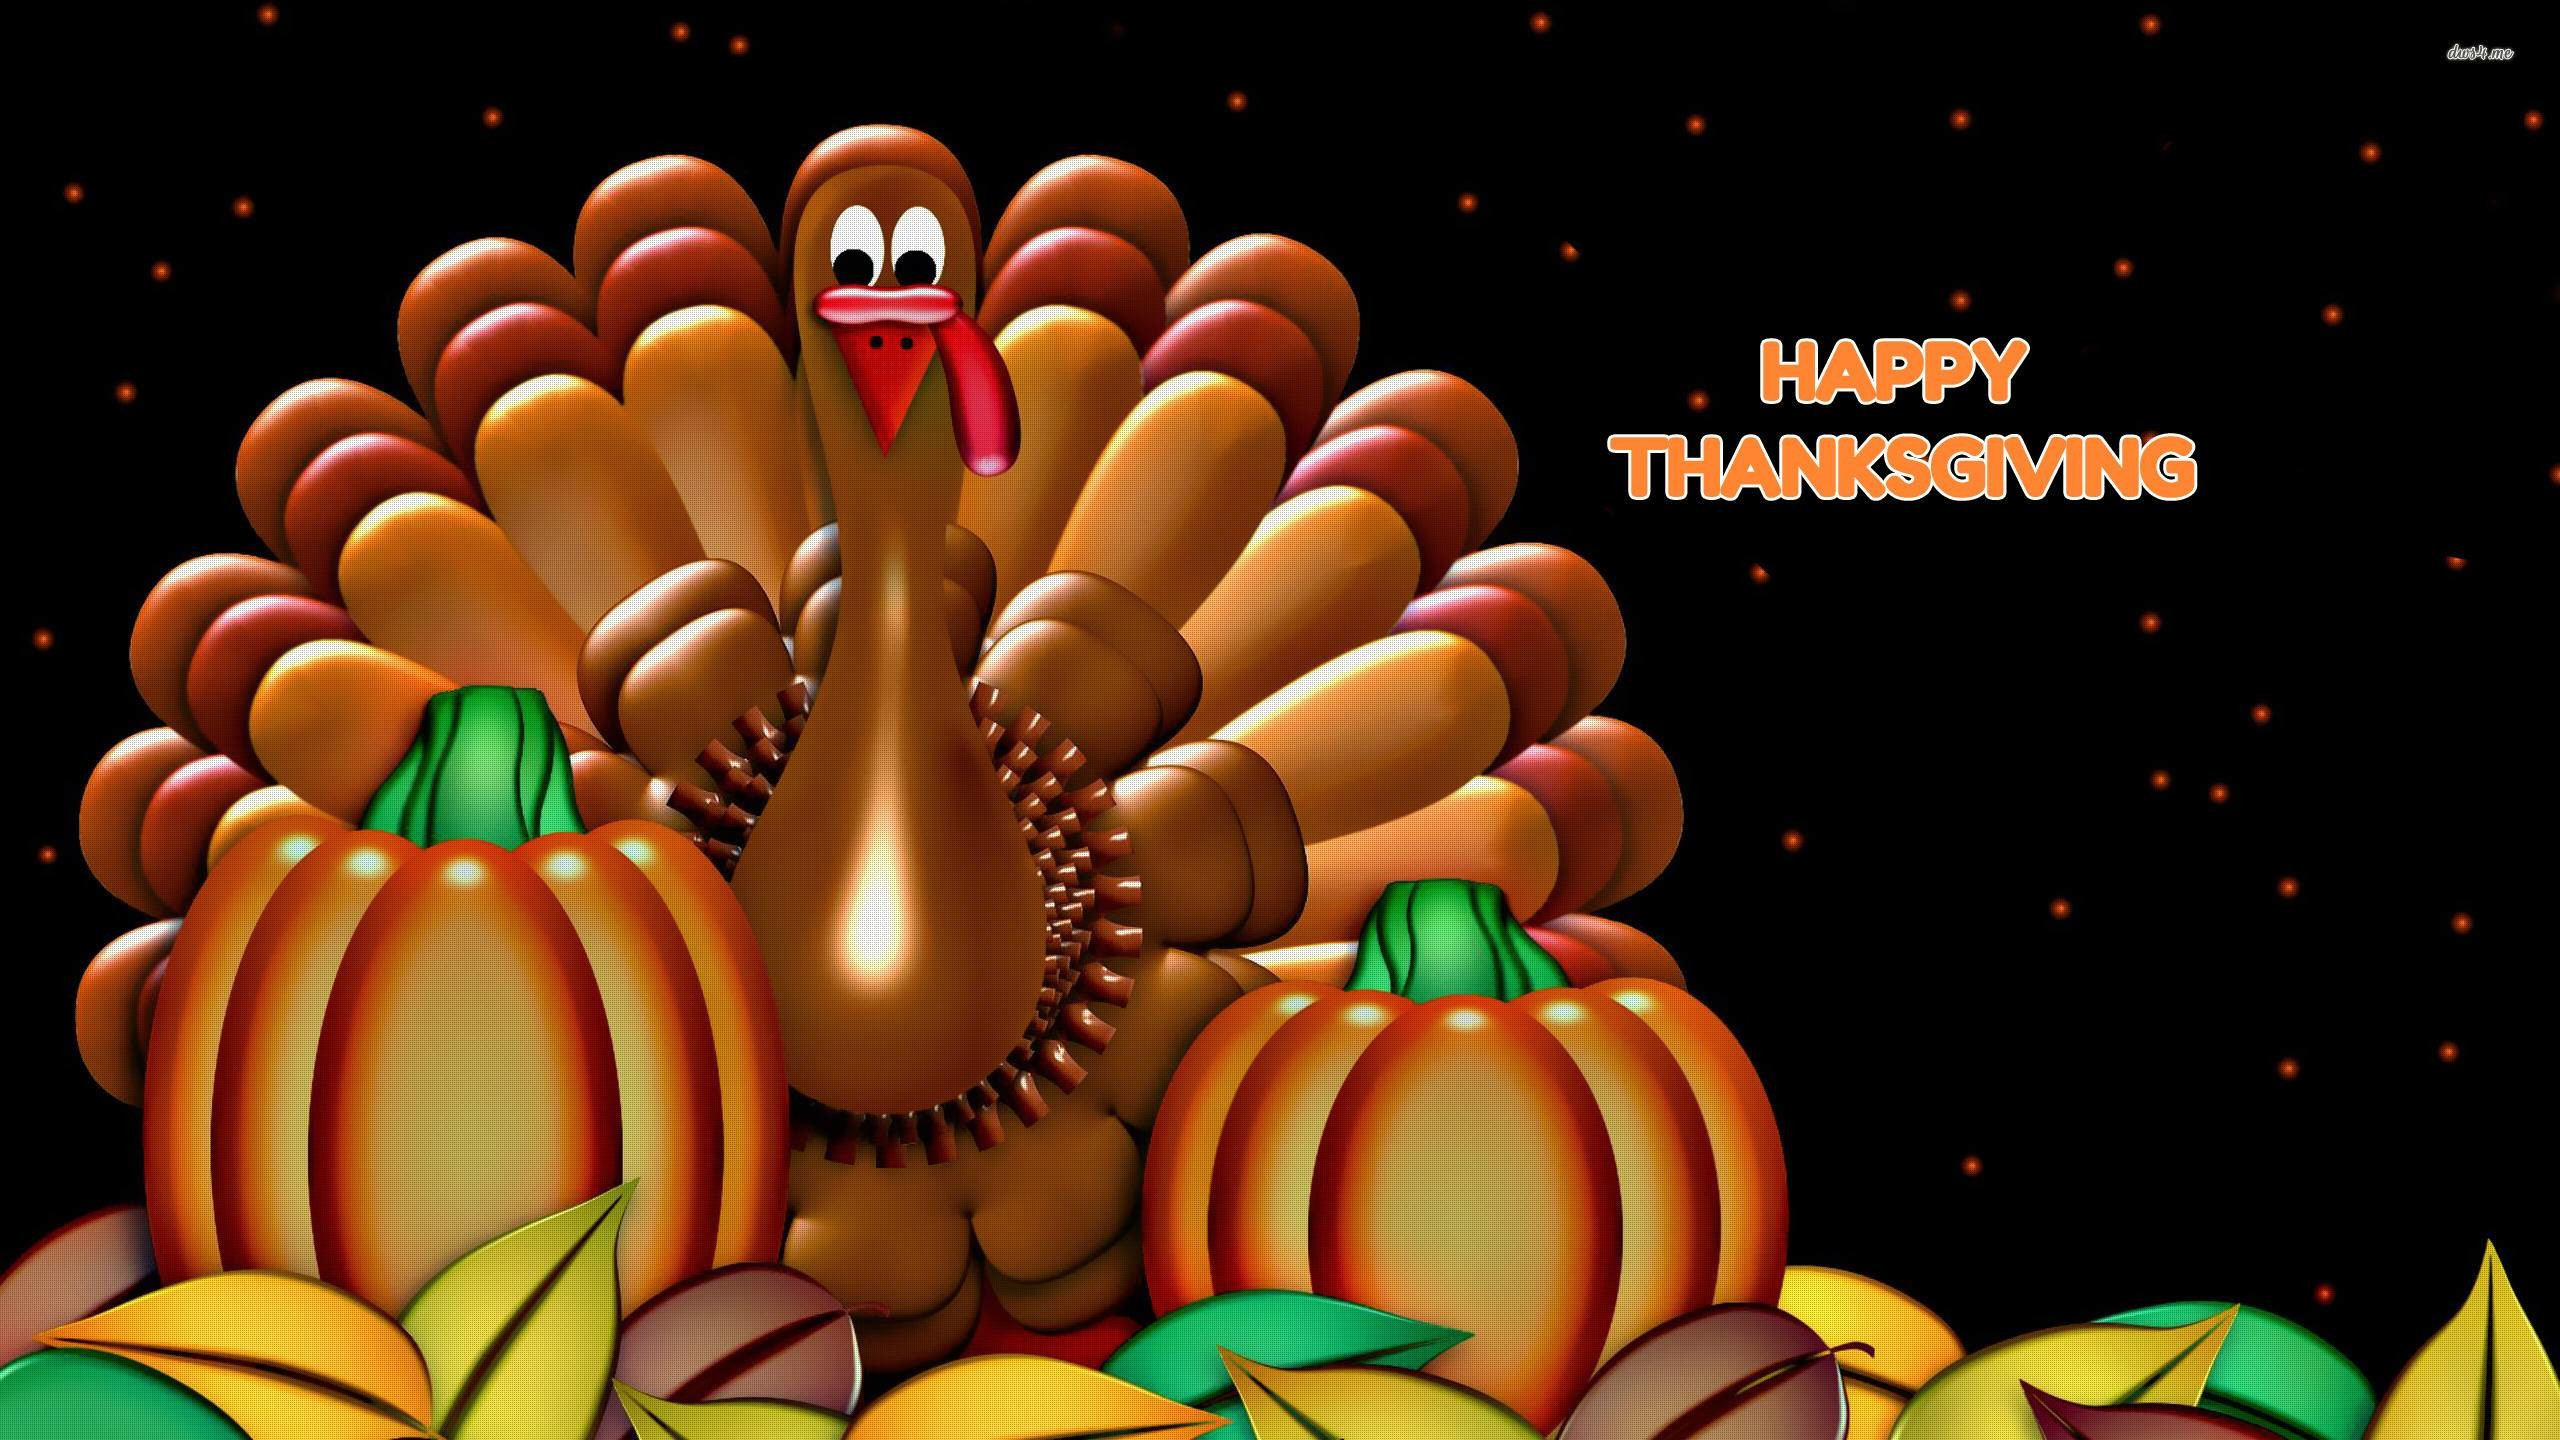 desktop wallpaper thanksgiving – www.